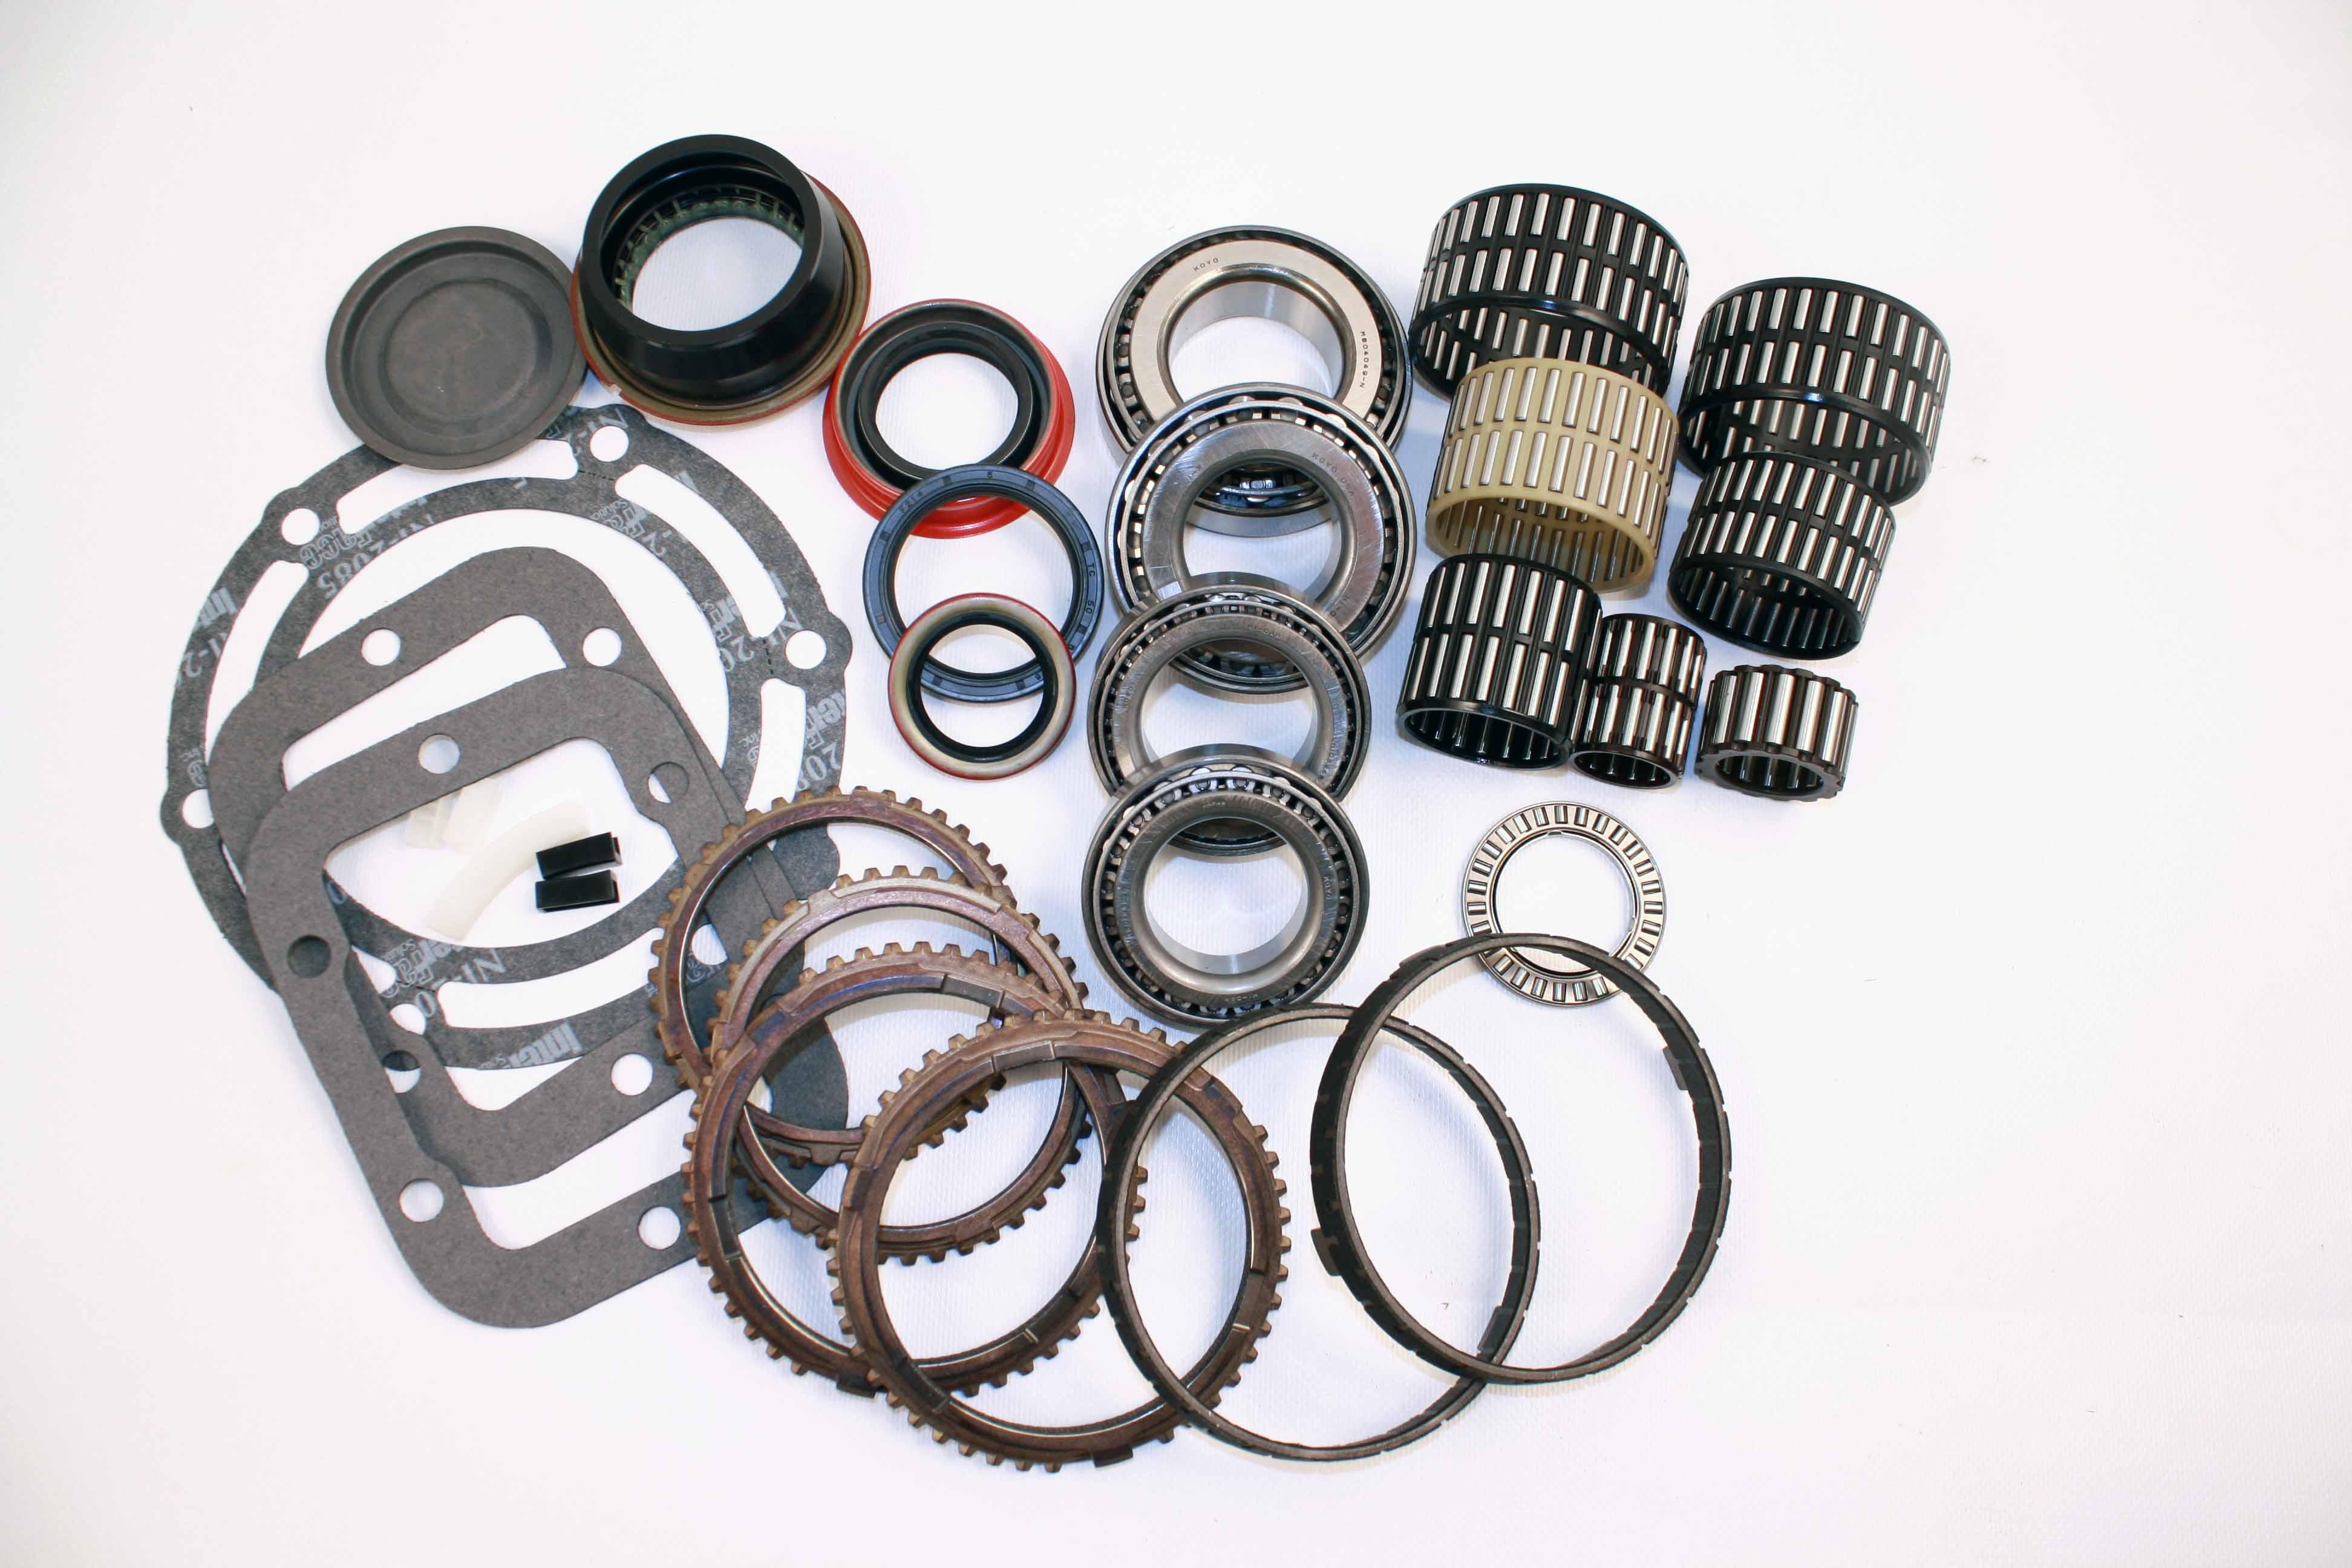 2002 chevrolet silverado 1500 transmission rebuild kit